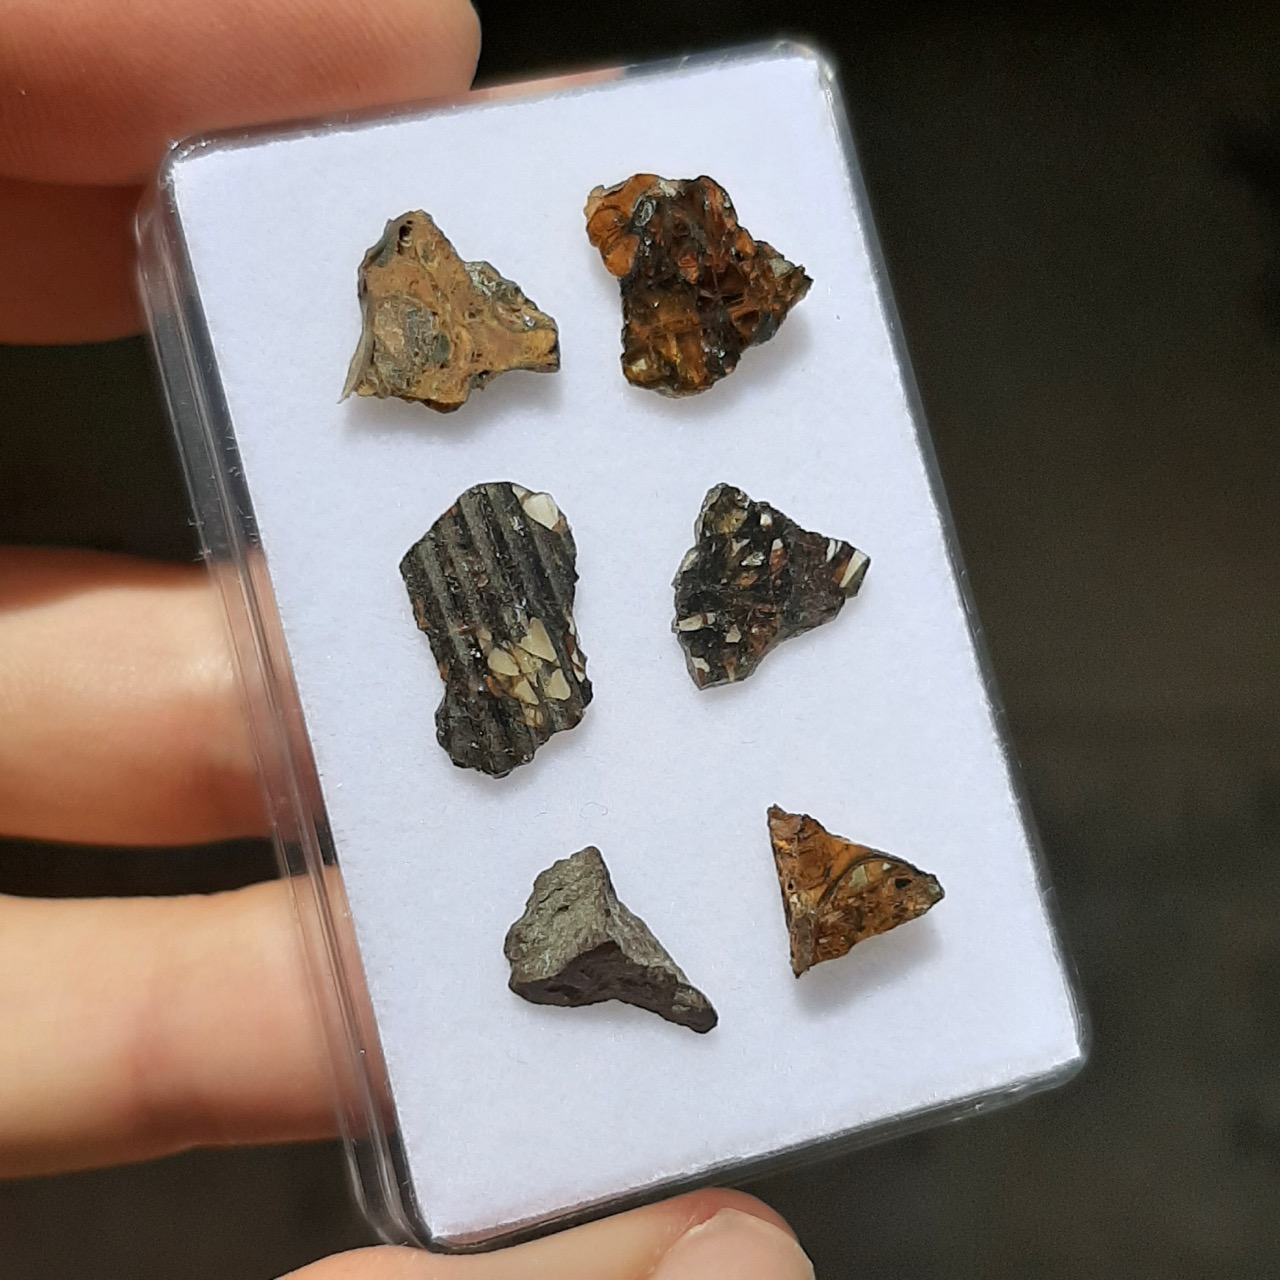 Jepara pallasite meteorite. 6 small slices.